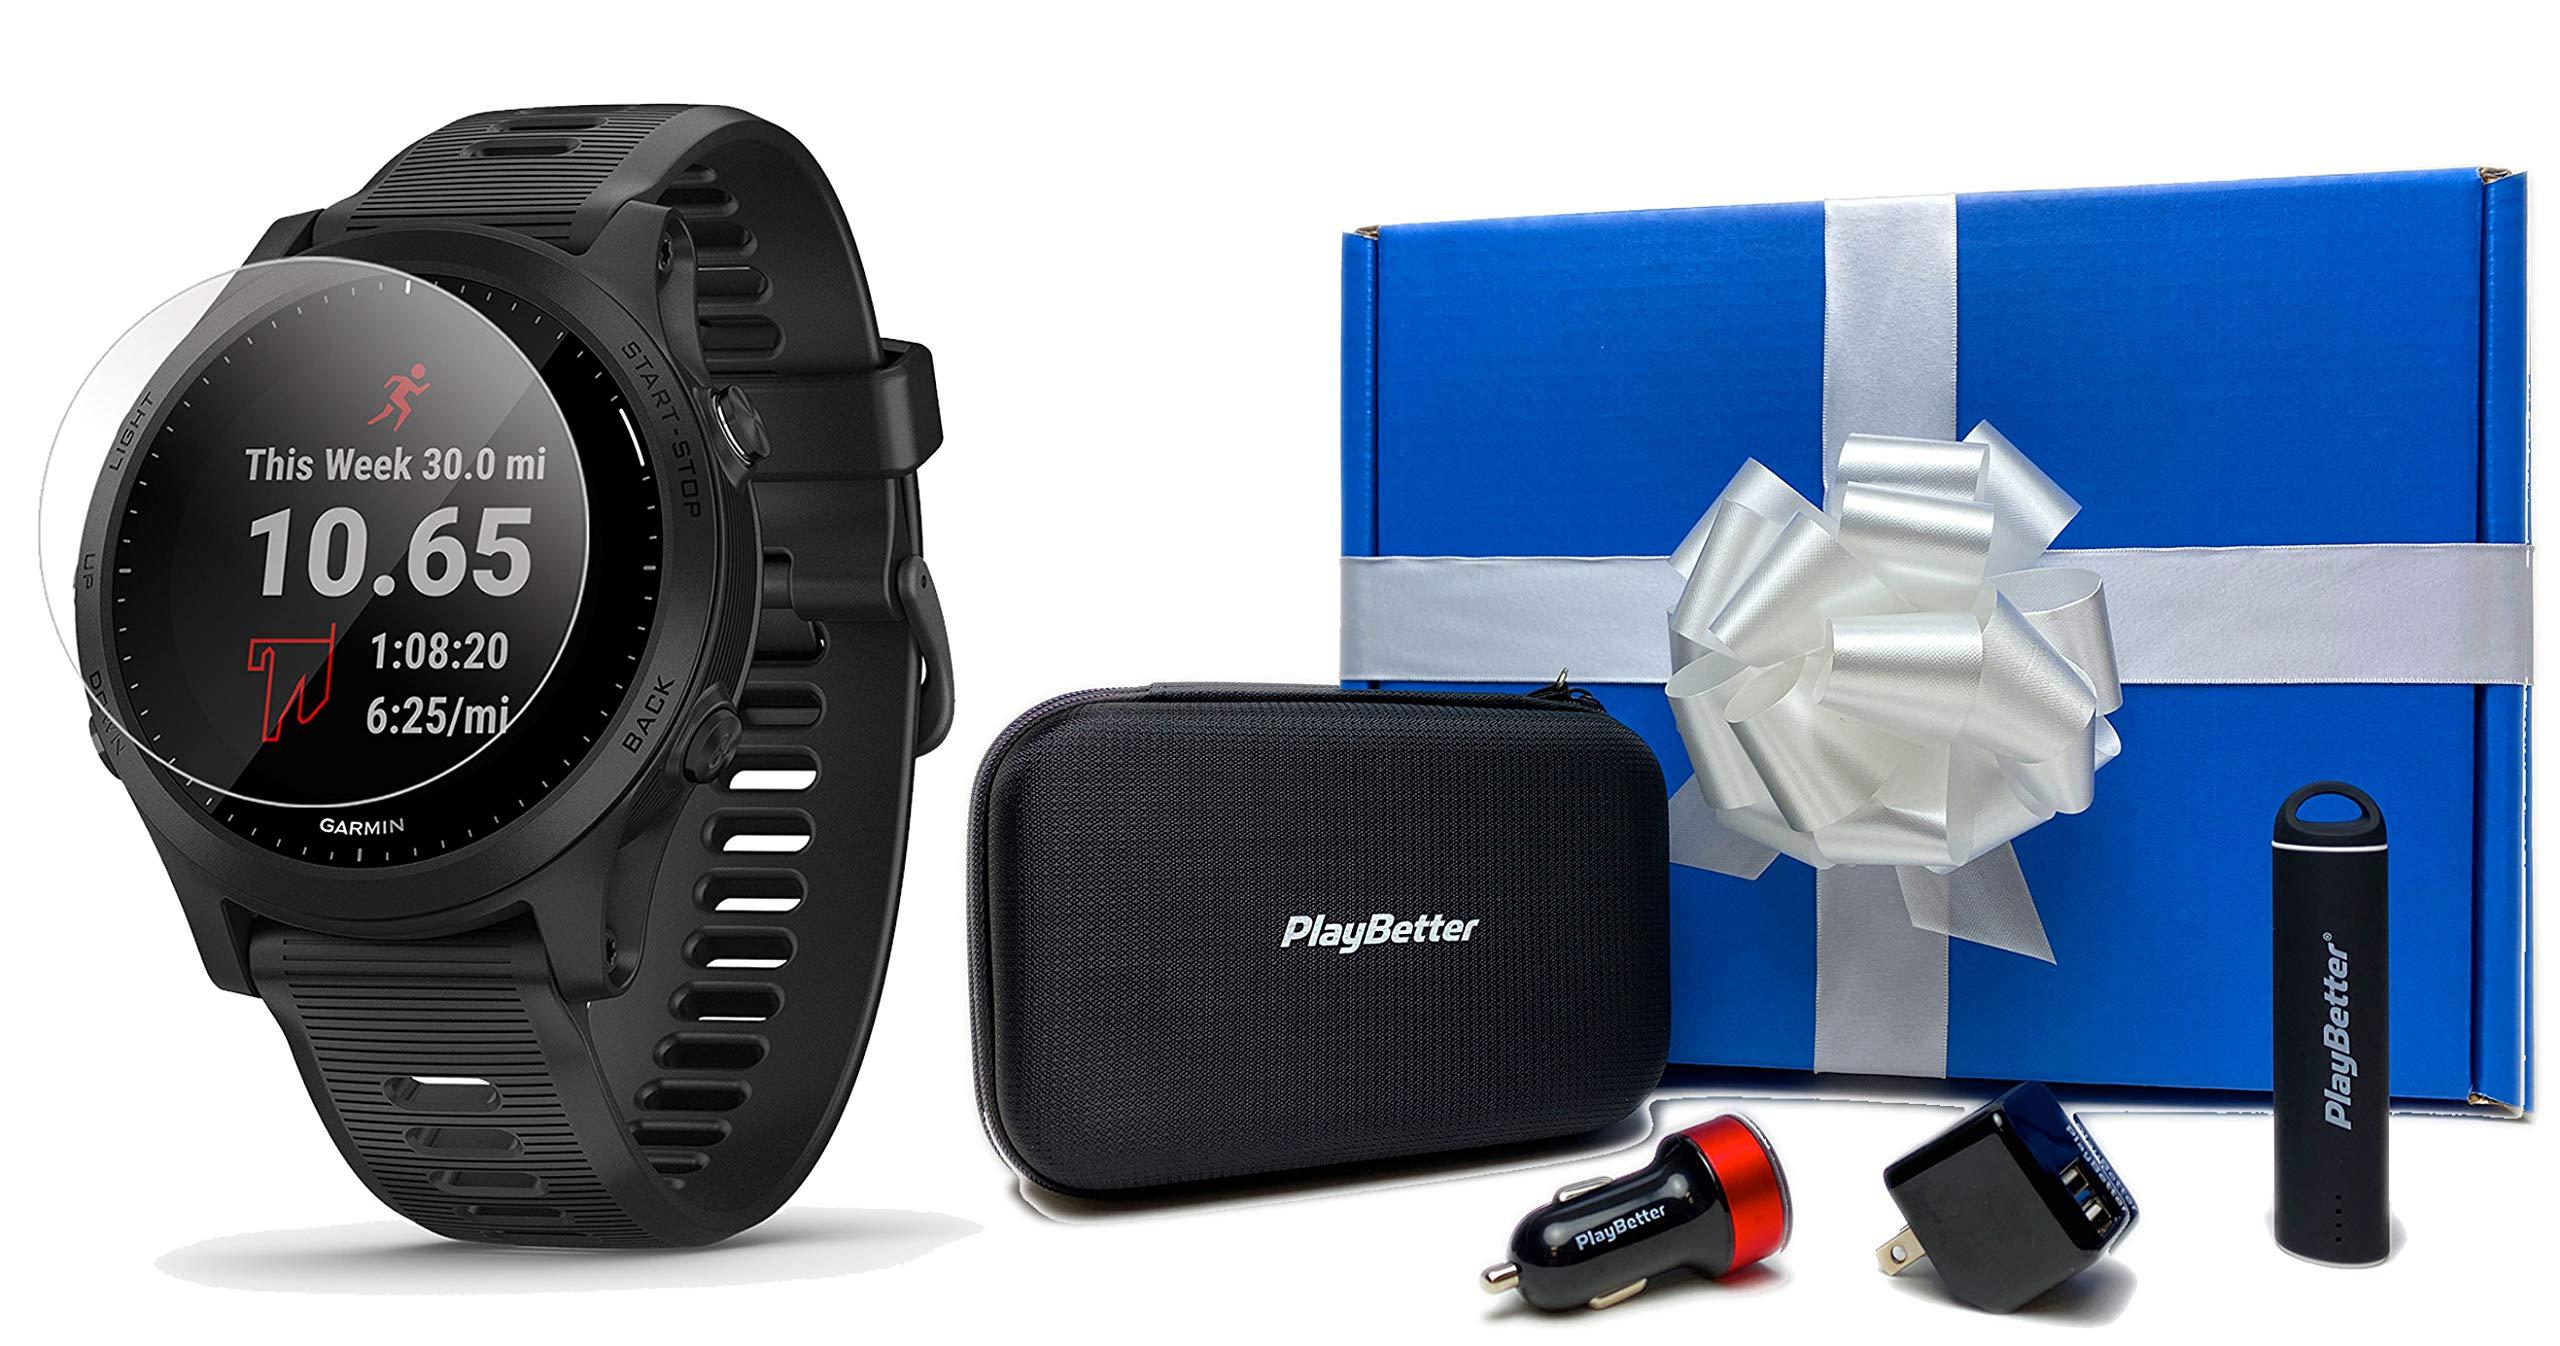 Garmin Forerunner 945 (Black) Running GPS Watch Gift Box Bundle | +PlayBetter HD Screen Protectors (x4), PlayBetter USB…